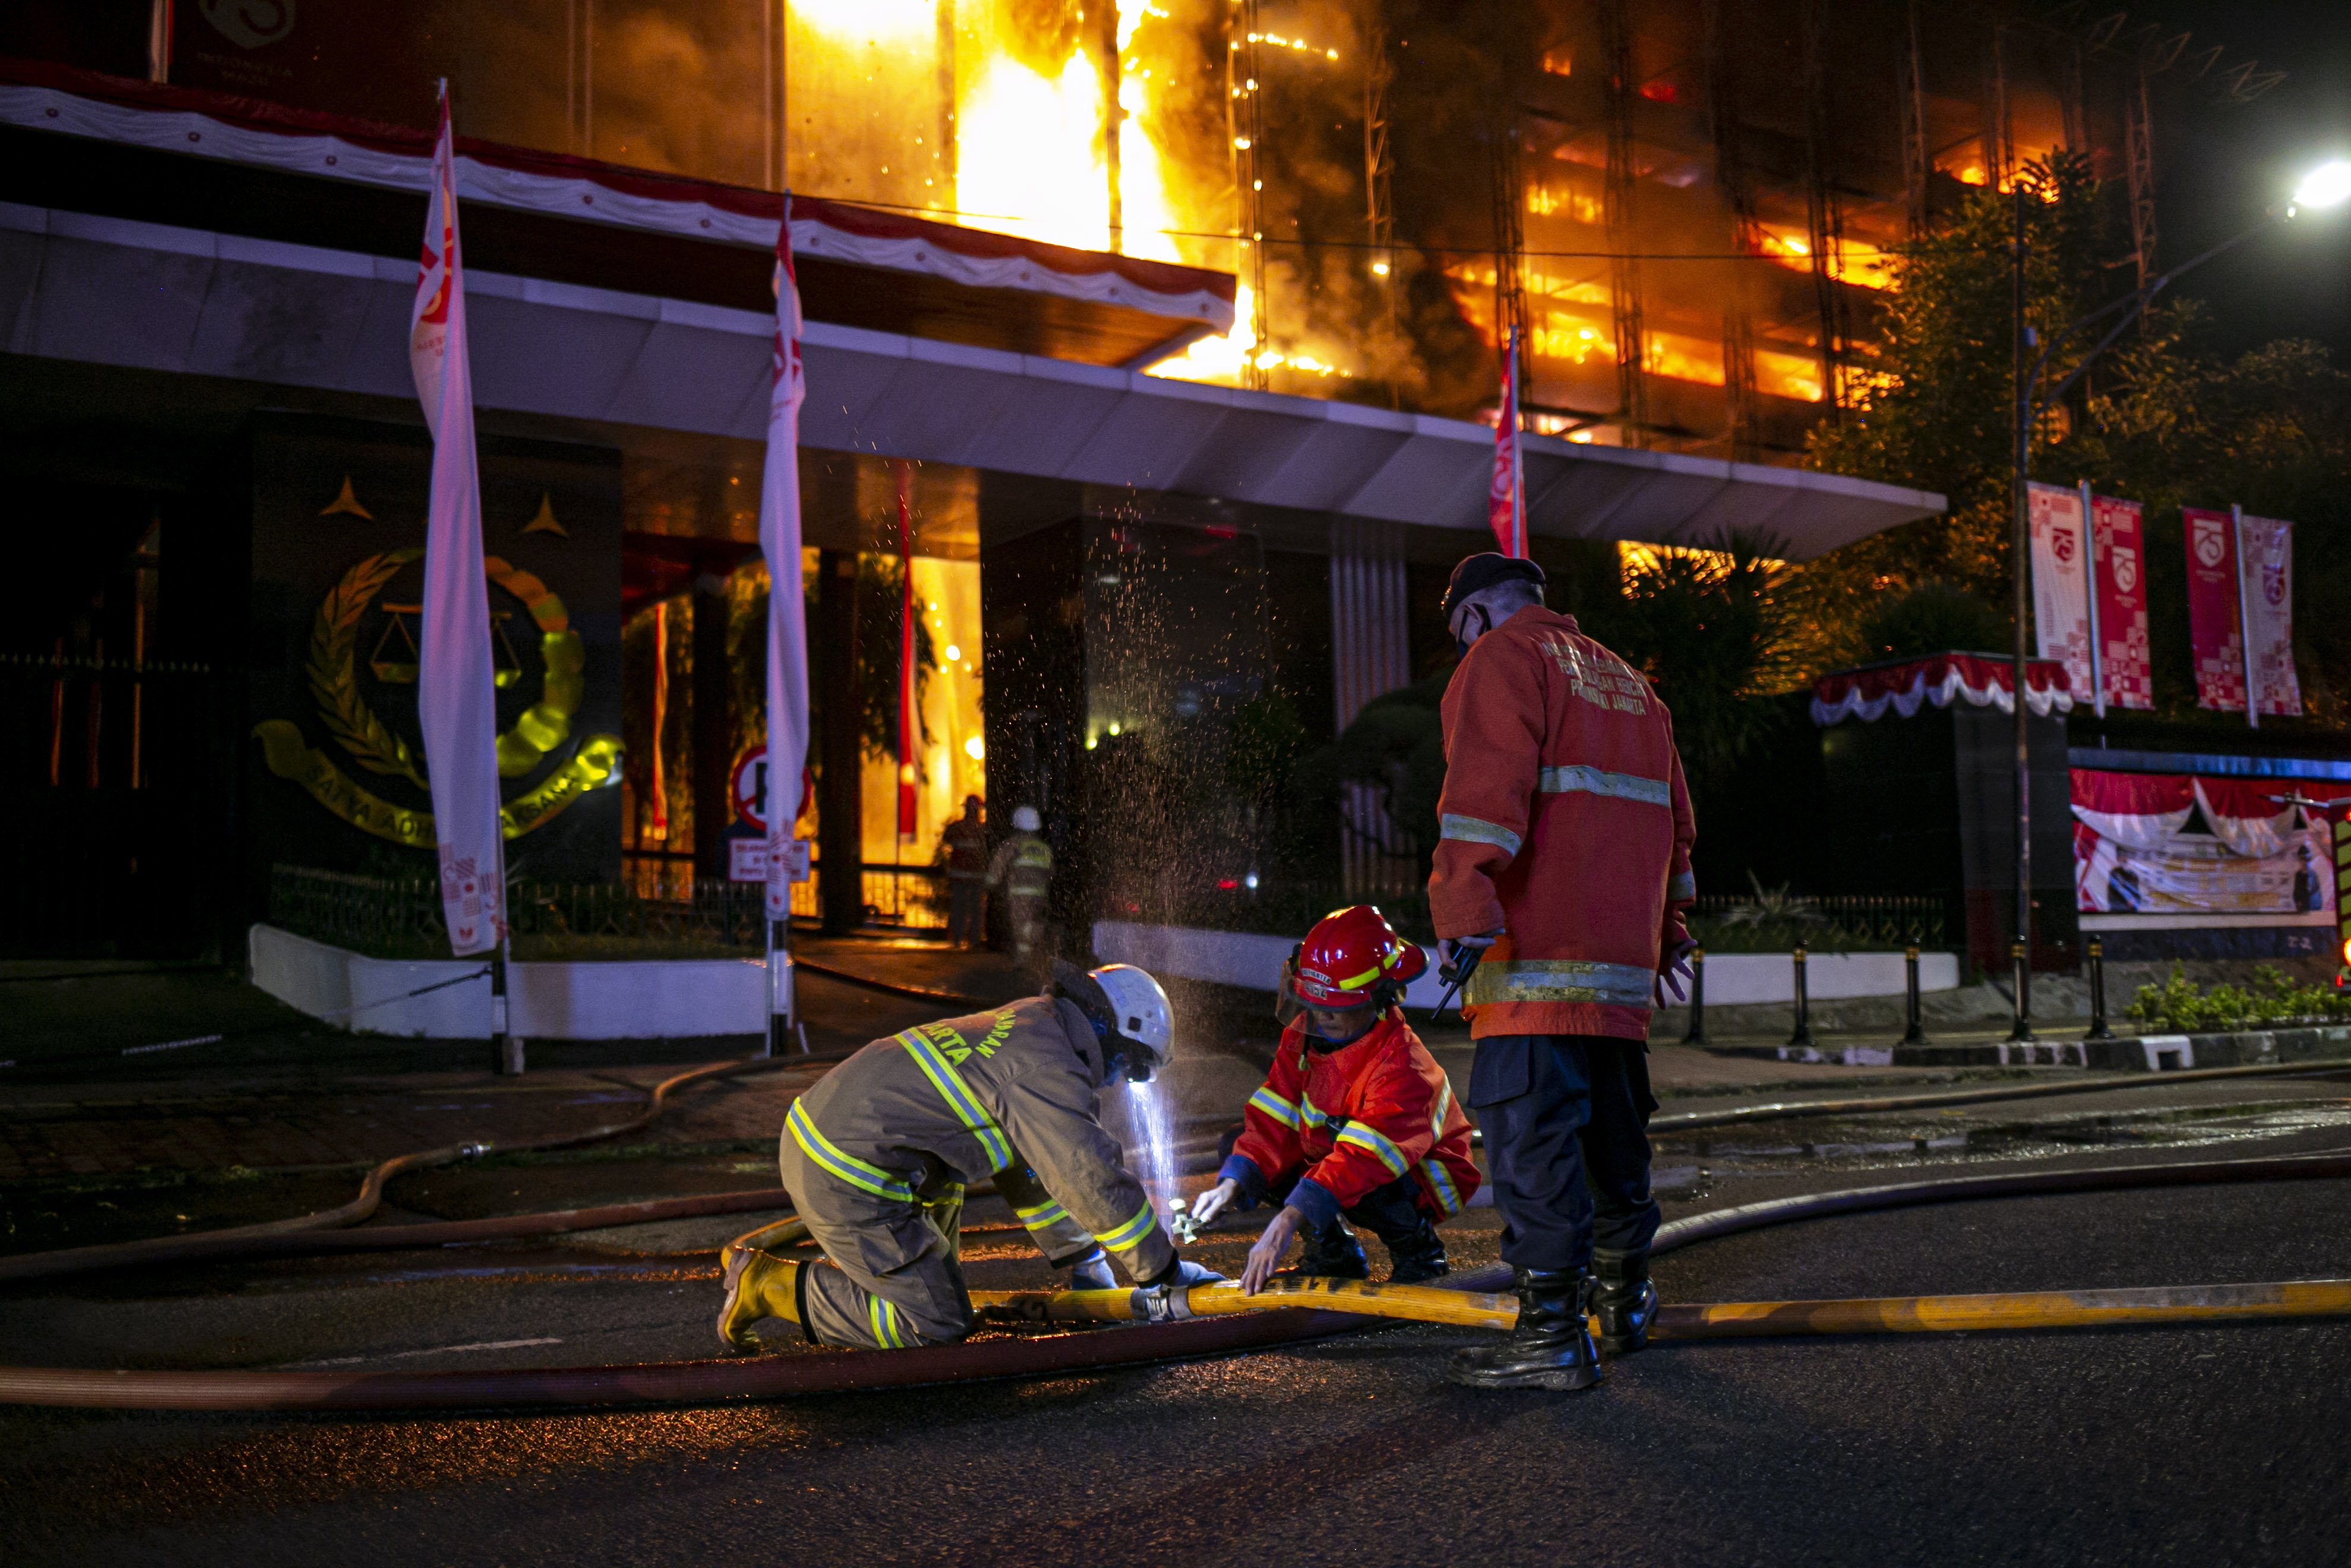 Petugas pemadam kebakaran berusaha memadamkan api yang membakar Gedung Kejaksaan Agung Republik Indonesia di Jl. Sultan Hasanuddin Dalam, Jakarta Selatan, Sabtu (22/8/2020). Informasi awal api muncul pertama kali di lantai enam gedung utama Kejaksaan Agung RI. Api semakin membesar sejak pertama kali mulai menyala sekitar pukul 19.10 WIB. Sejauh ini, lebih dari 20 unit mobil pemadam kebakaran dikerahkan untuk memadamkan api.